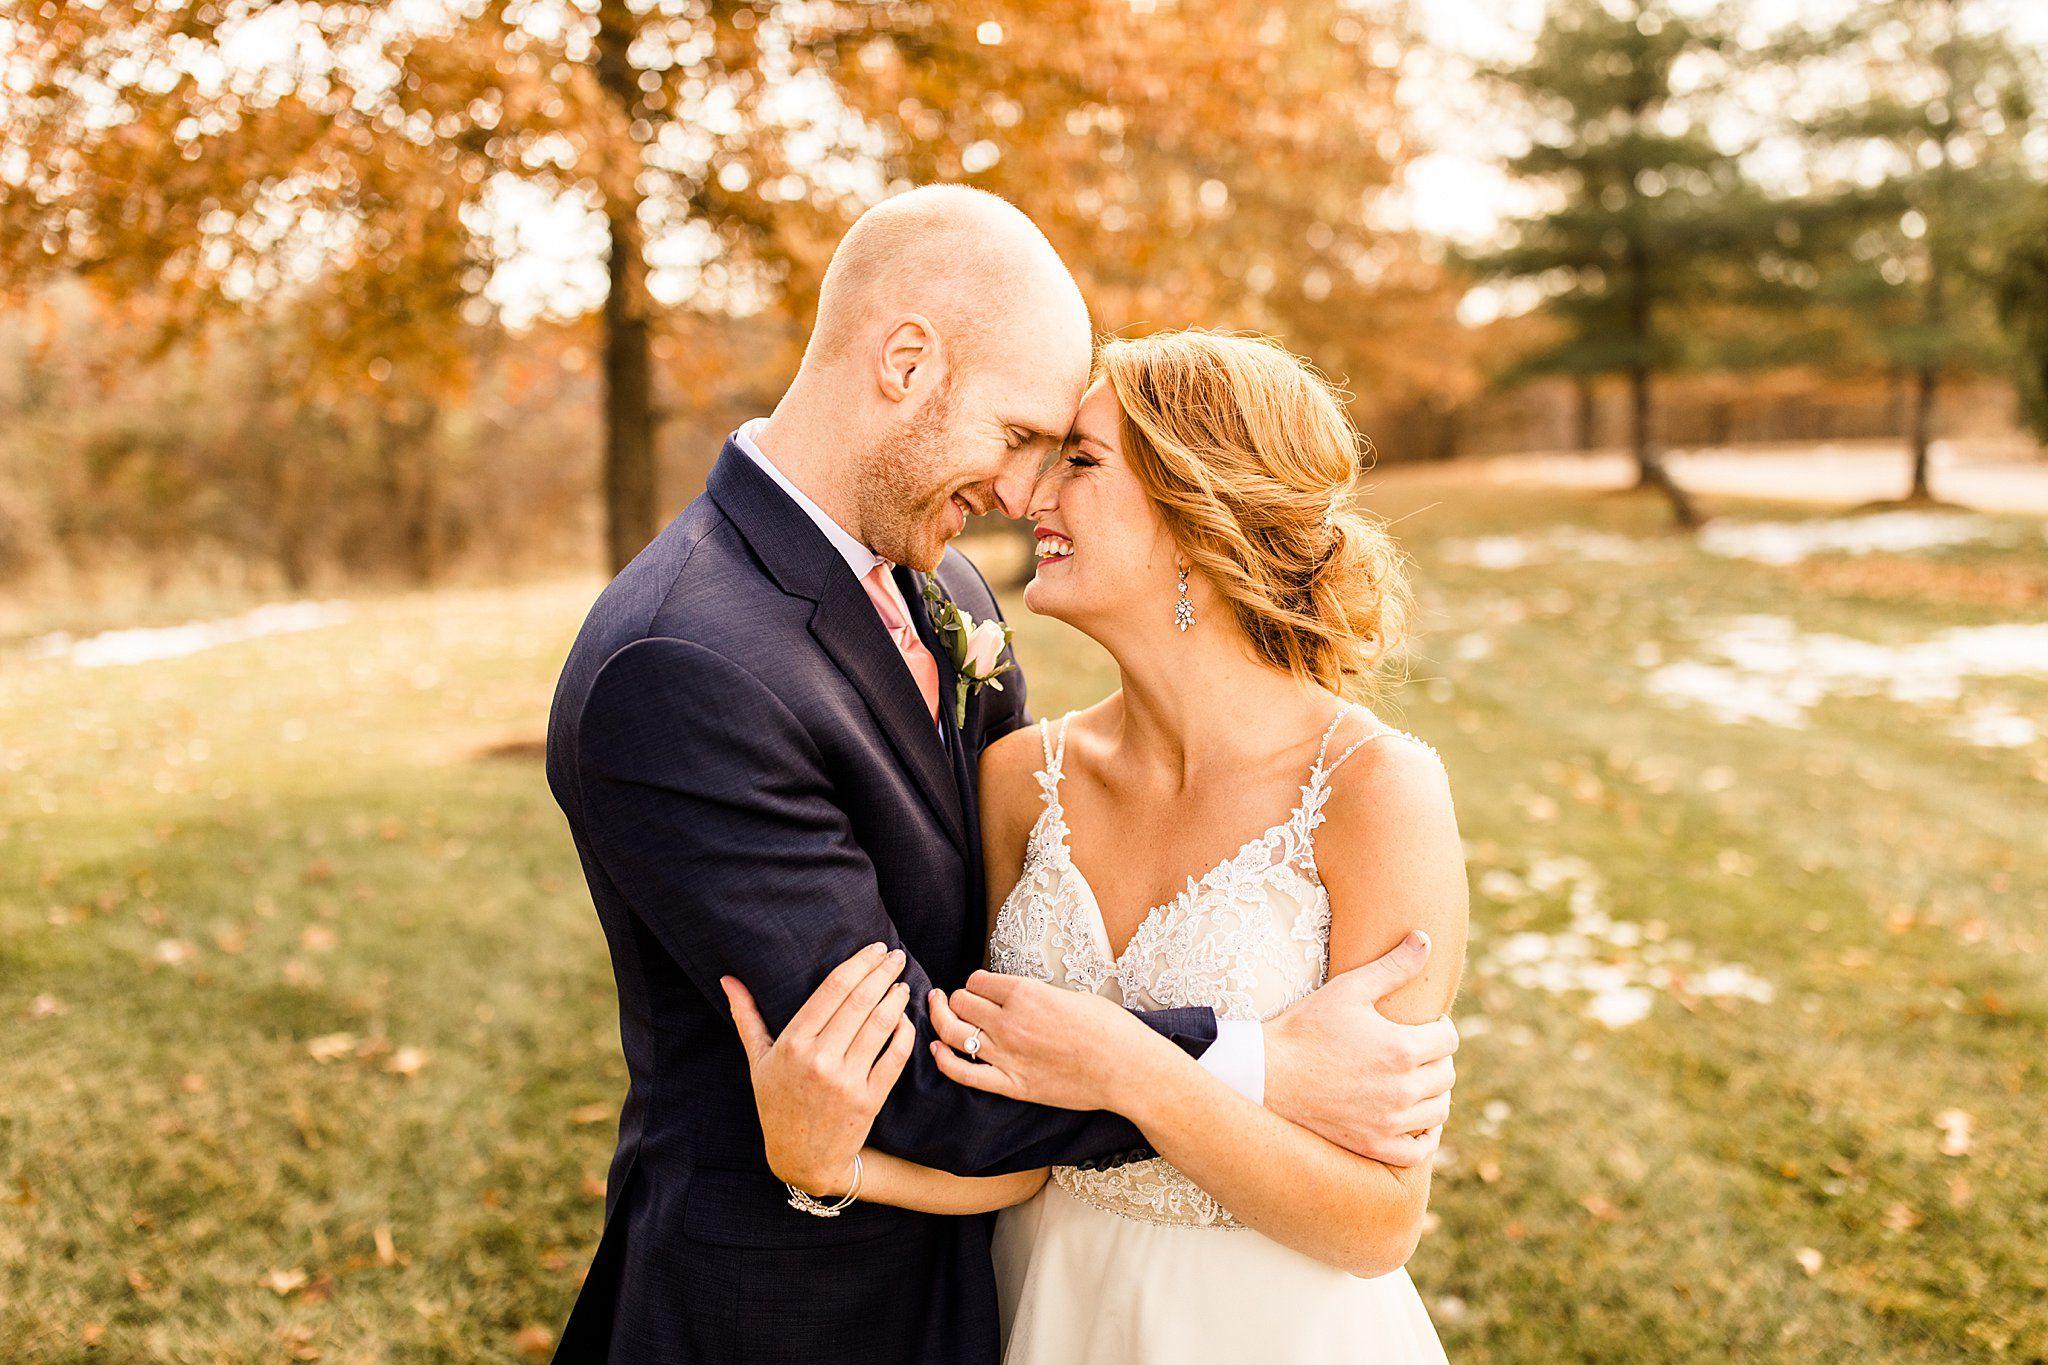 Cory And Sarah Eureka Wedding Photographer St Louis Wedding Photography Jessica Lauren Photography Wedding Inspiration Fall Cozy Wedding Wedding Photographers